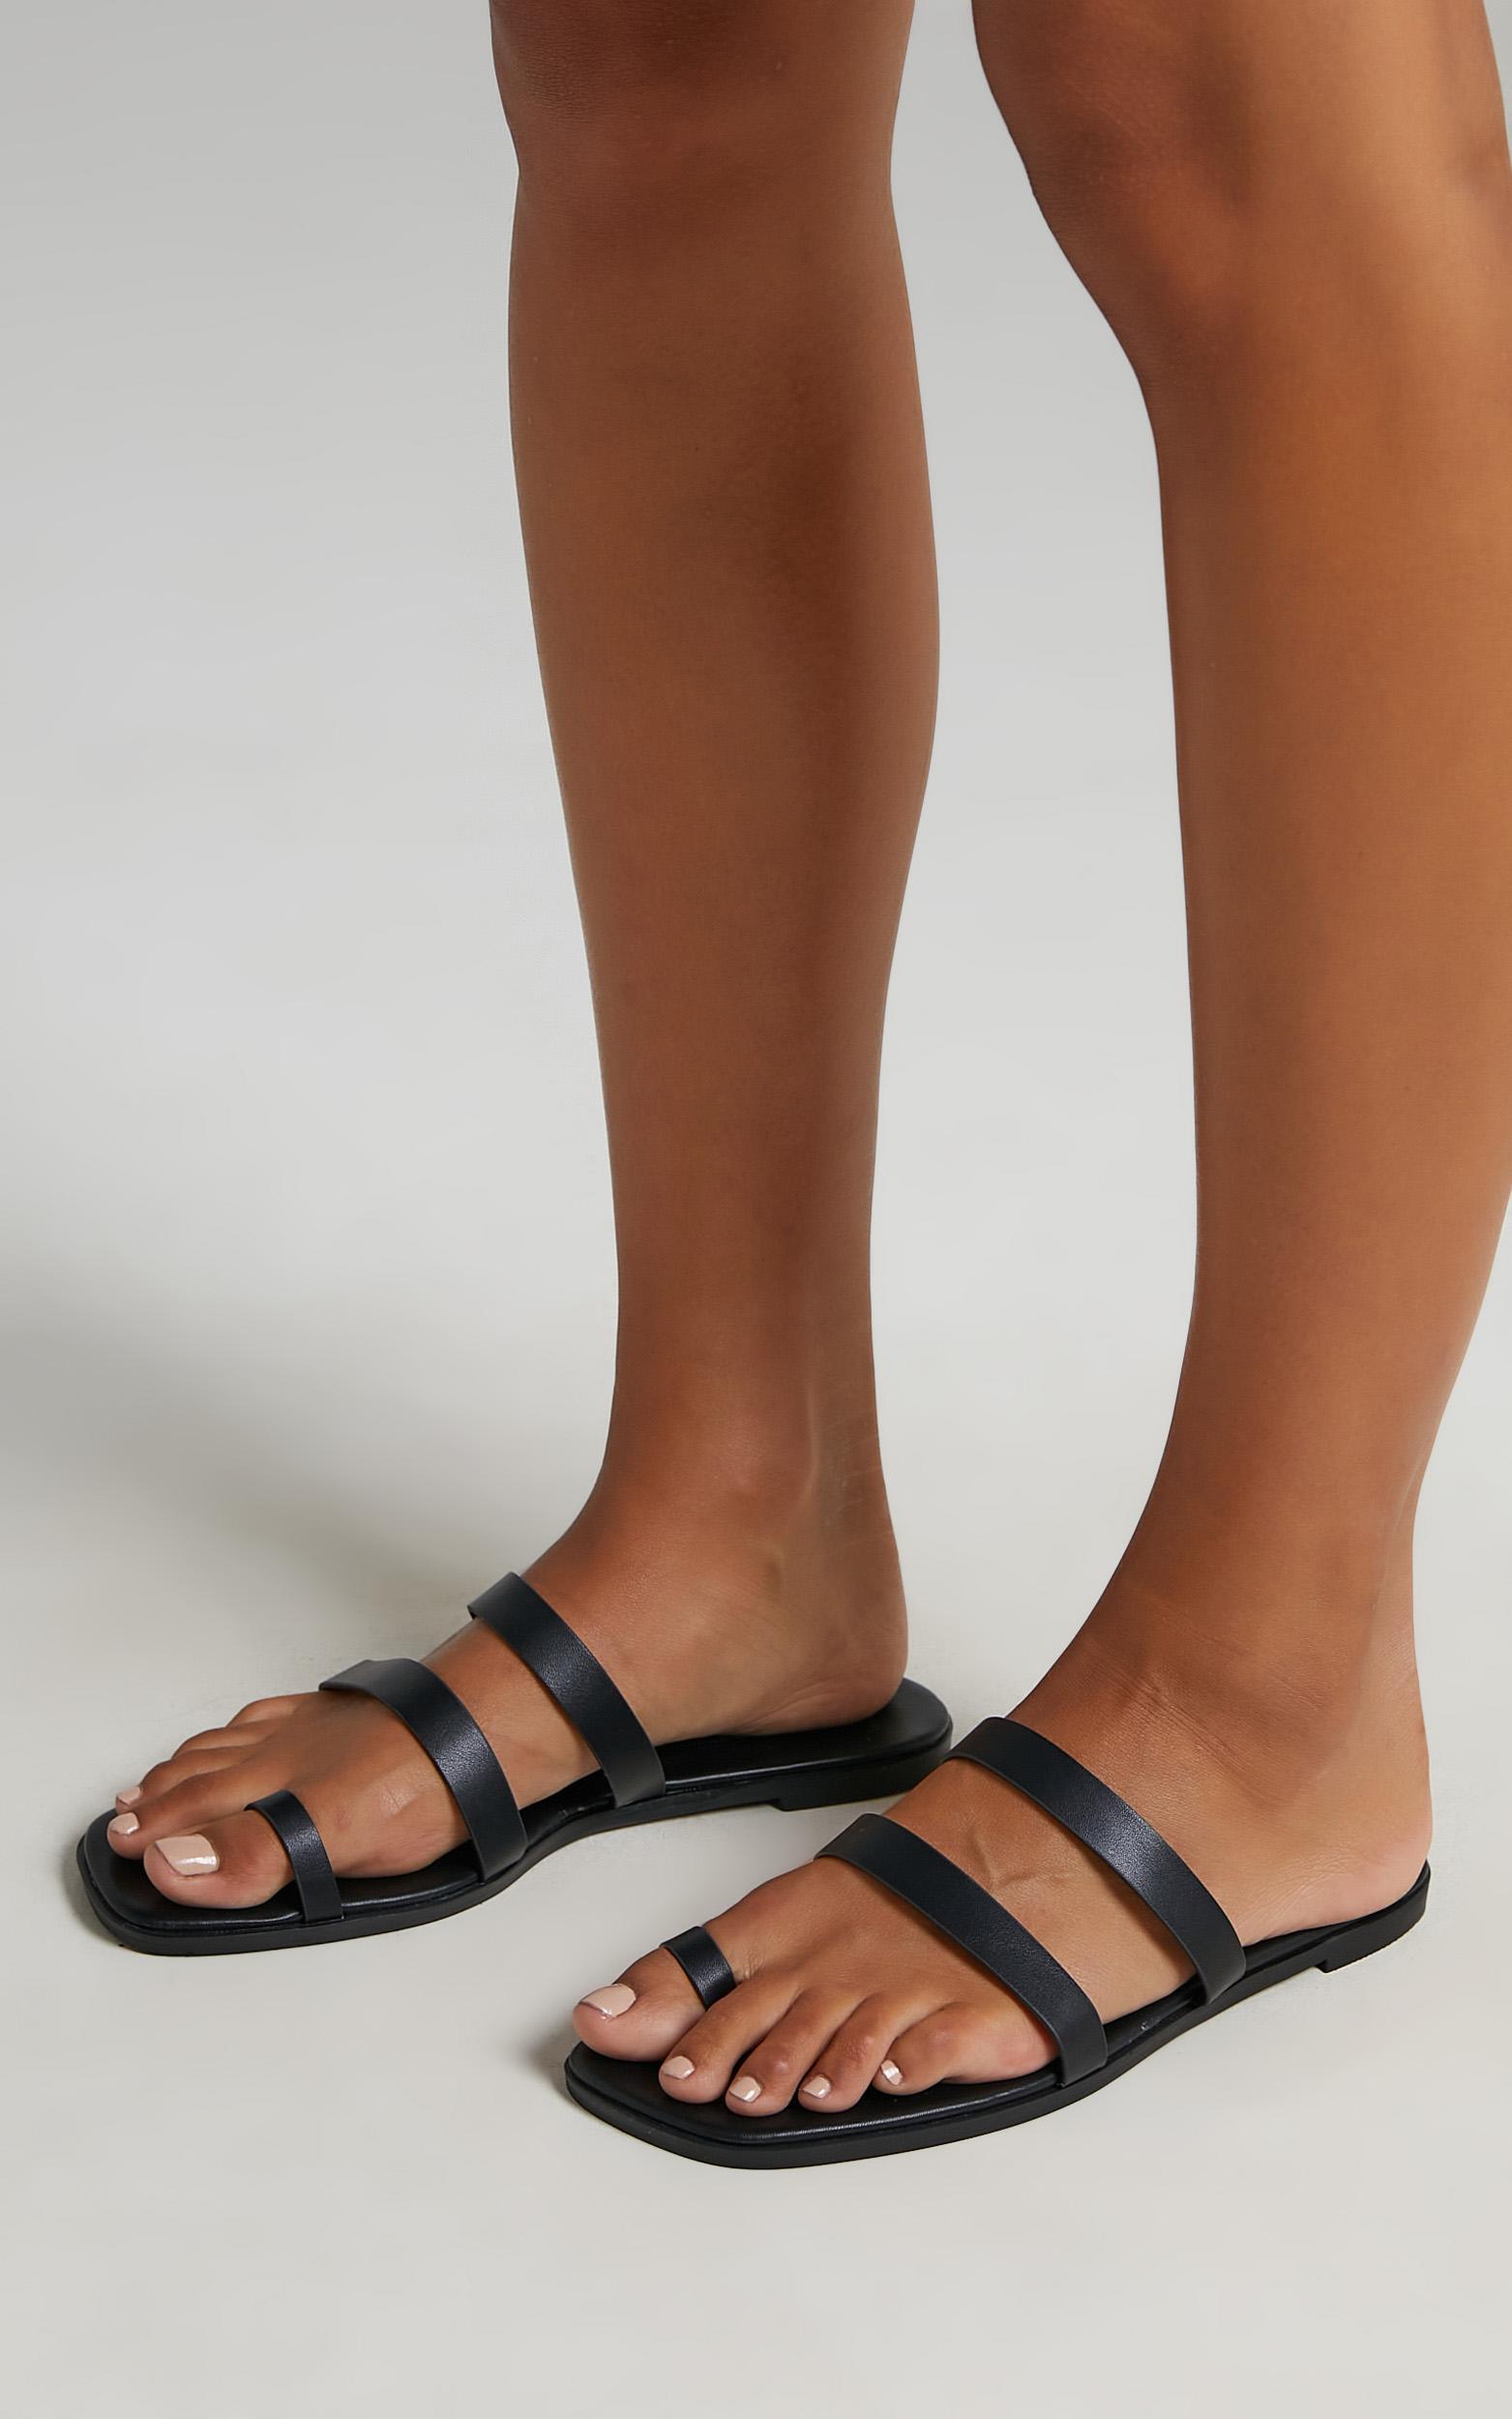 Billini - Leah Sandals in Black - 05, BLK1, hi-res image number null